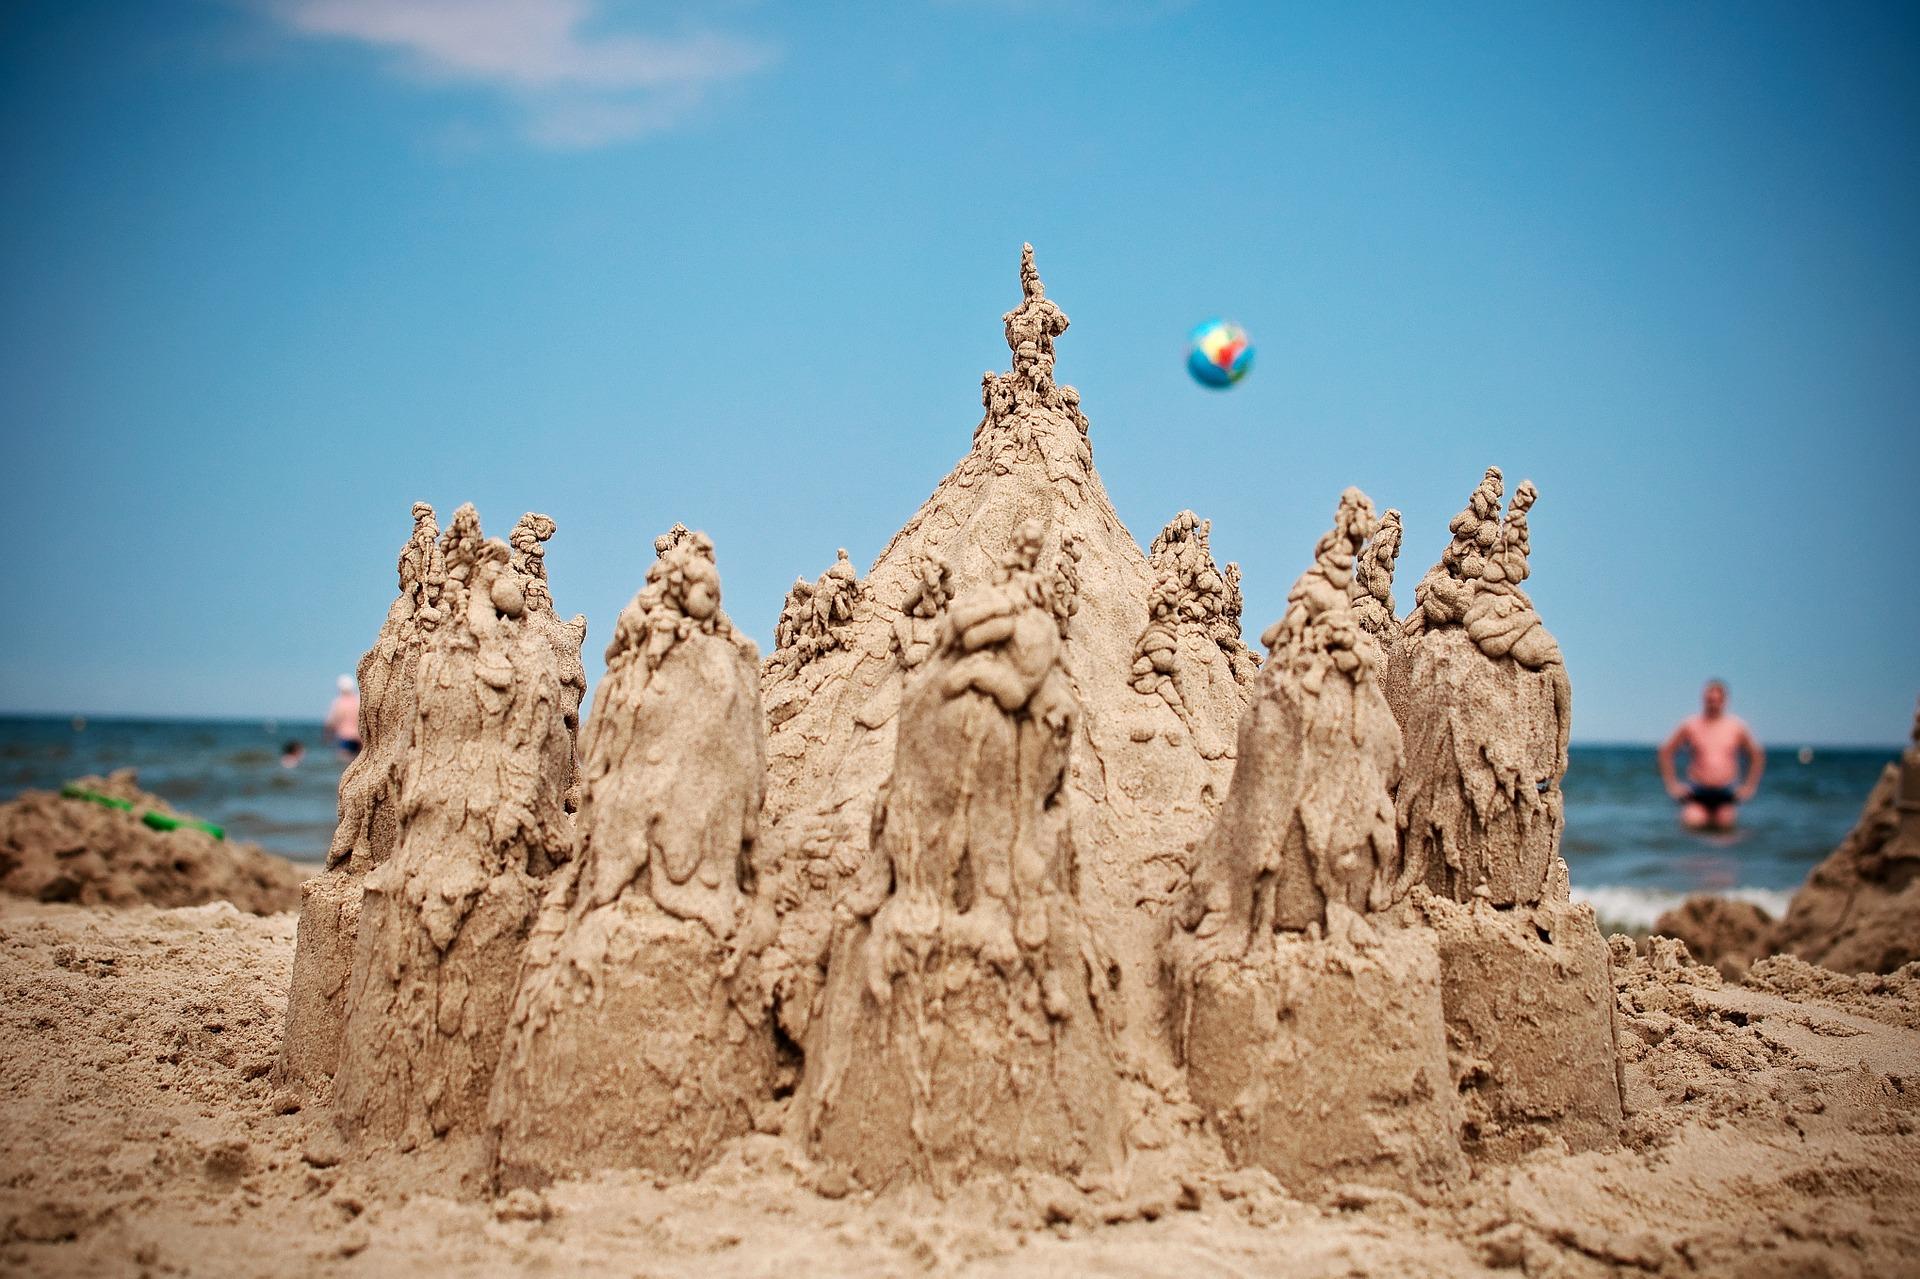 Sand Castle, Strand, Meer, Wasser, Sommer - Wallpaper HD - Prof.-falken.com